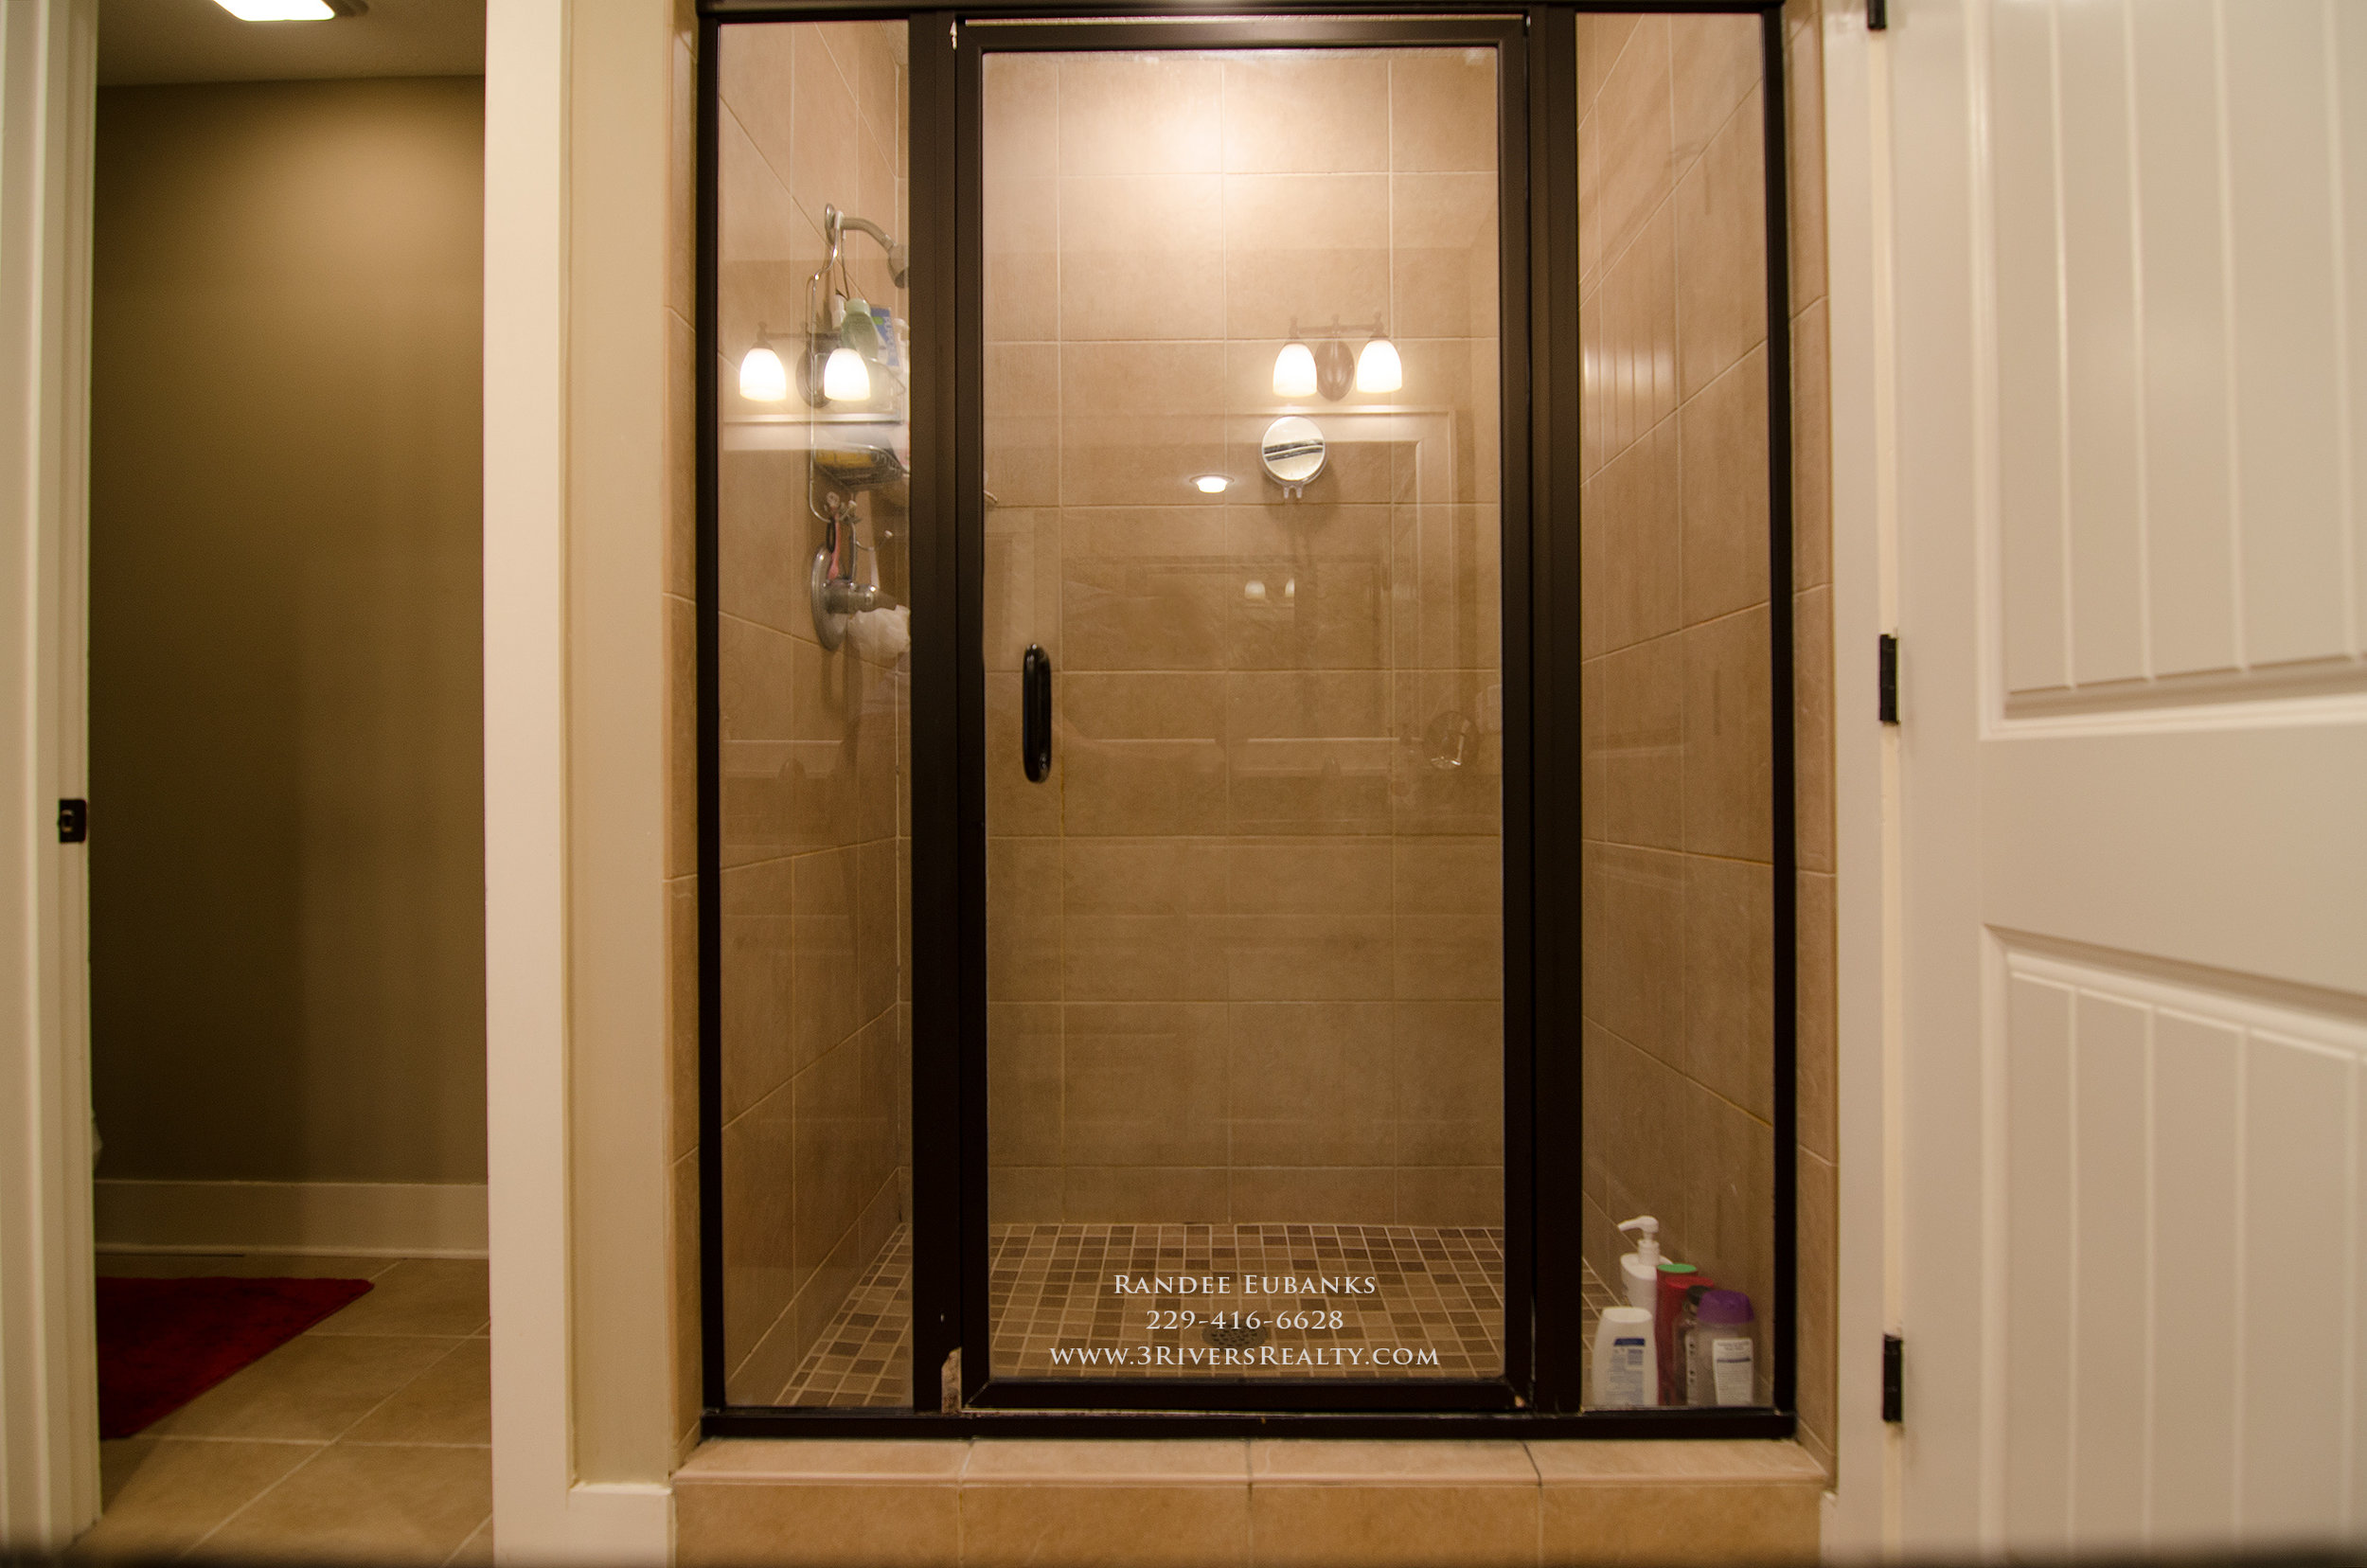 3riversrealty_bainbridge-georgia-home-for-sale_3-bed-2-bath_outdoor-fireplace_three-rivers-realty_mills-brock_Taurus-USA_-pool_back-porch-master-bath-shower.jpg